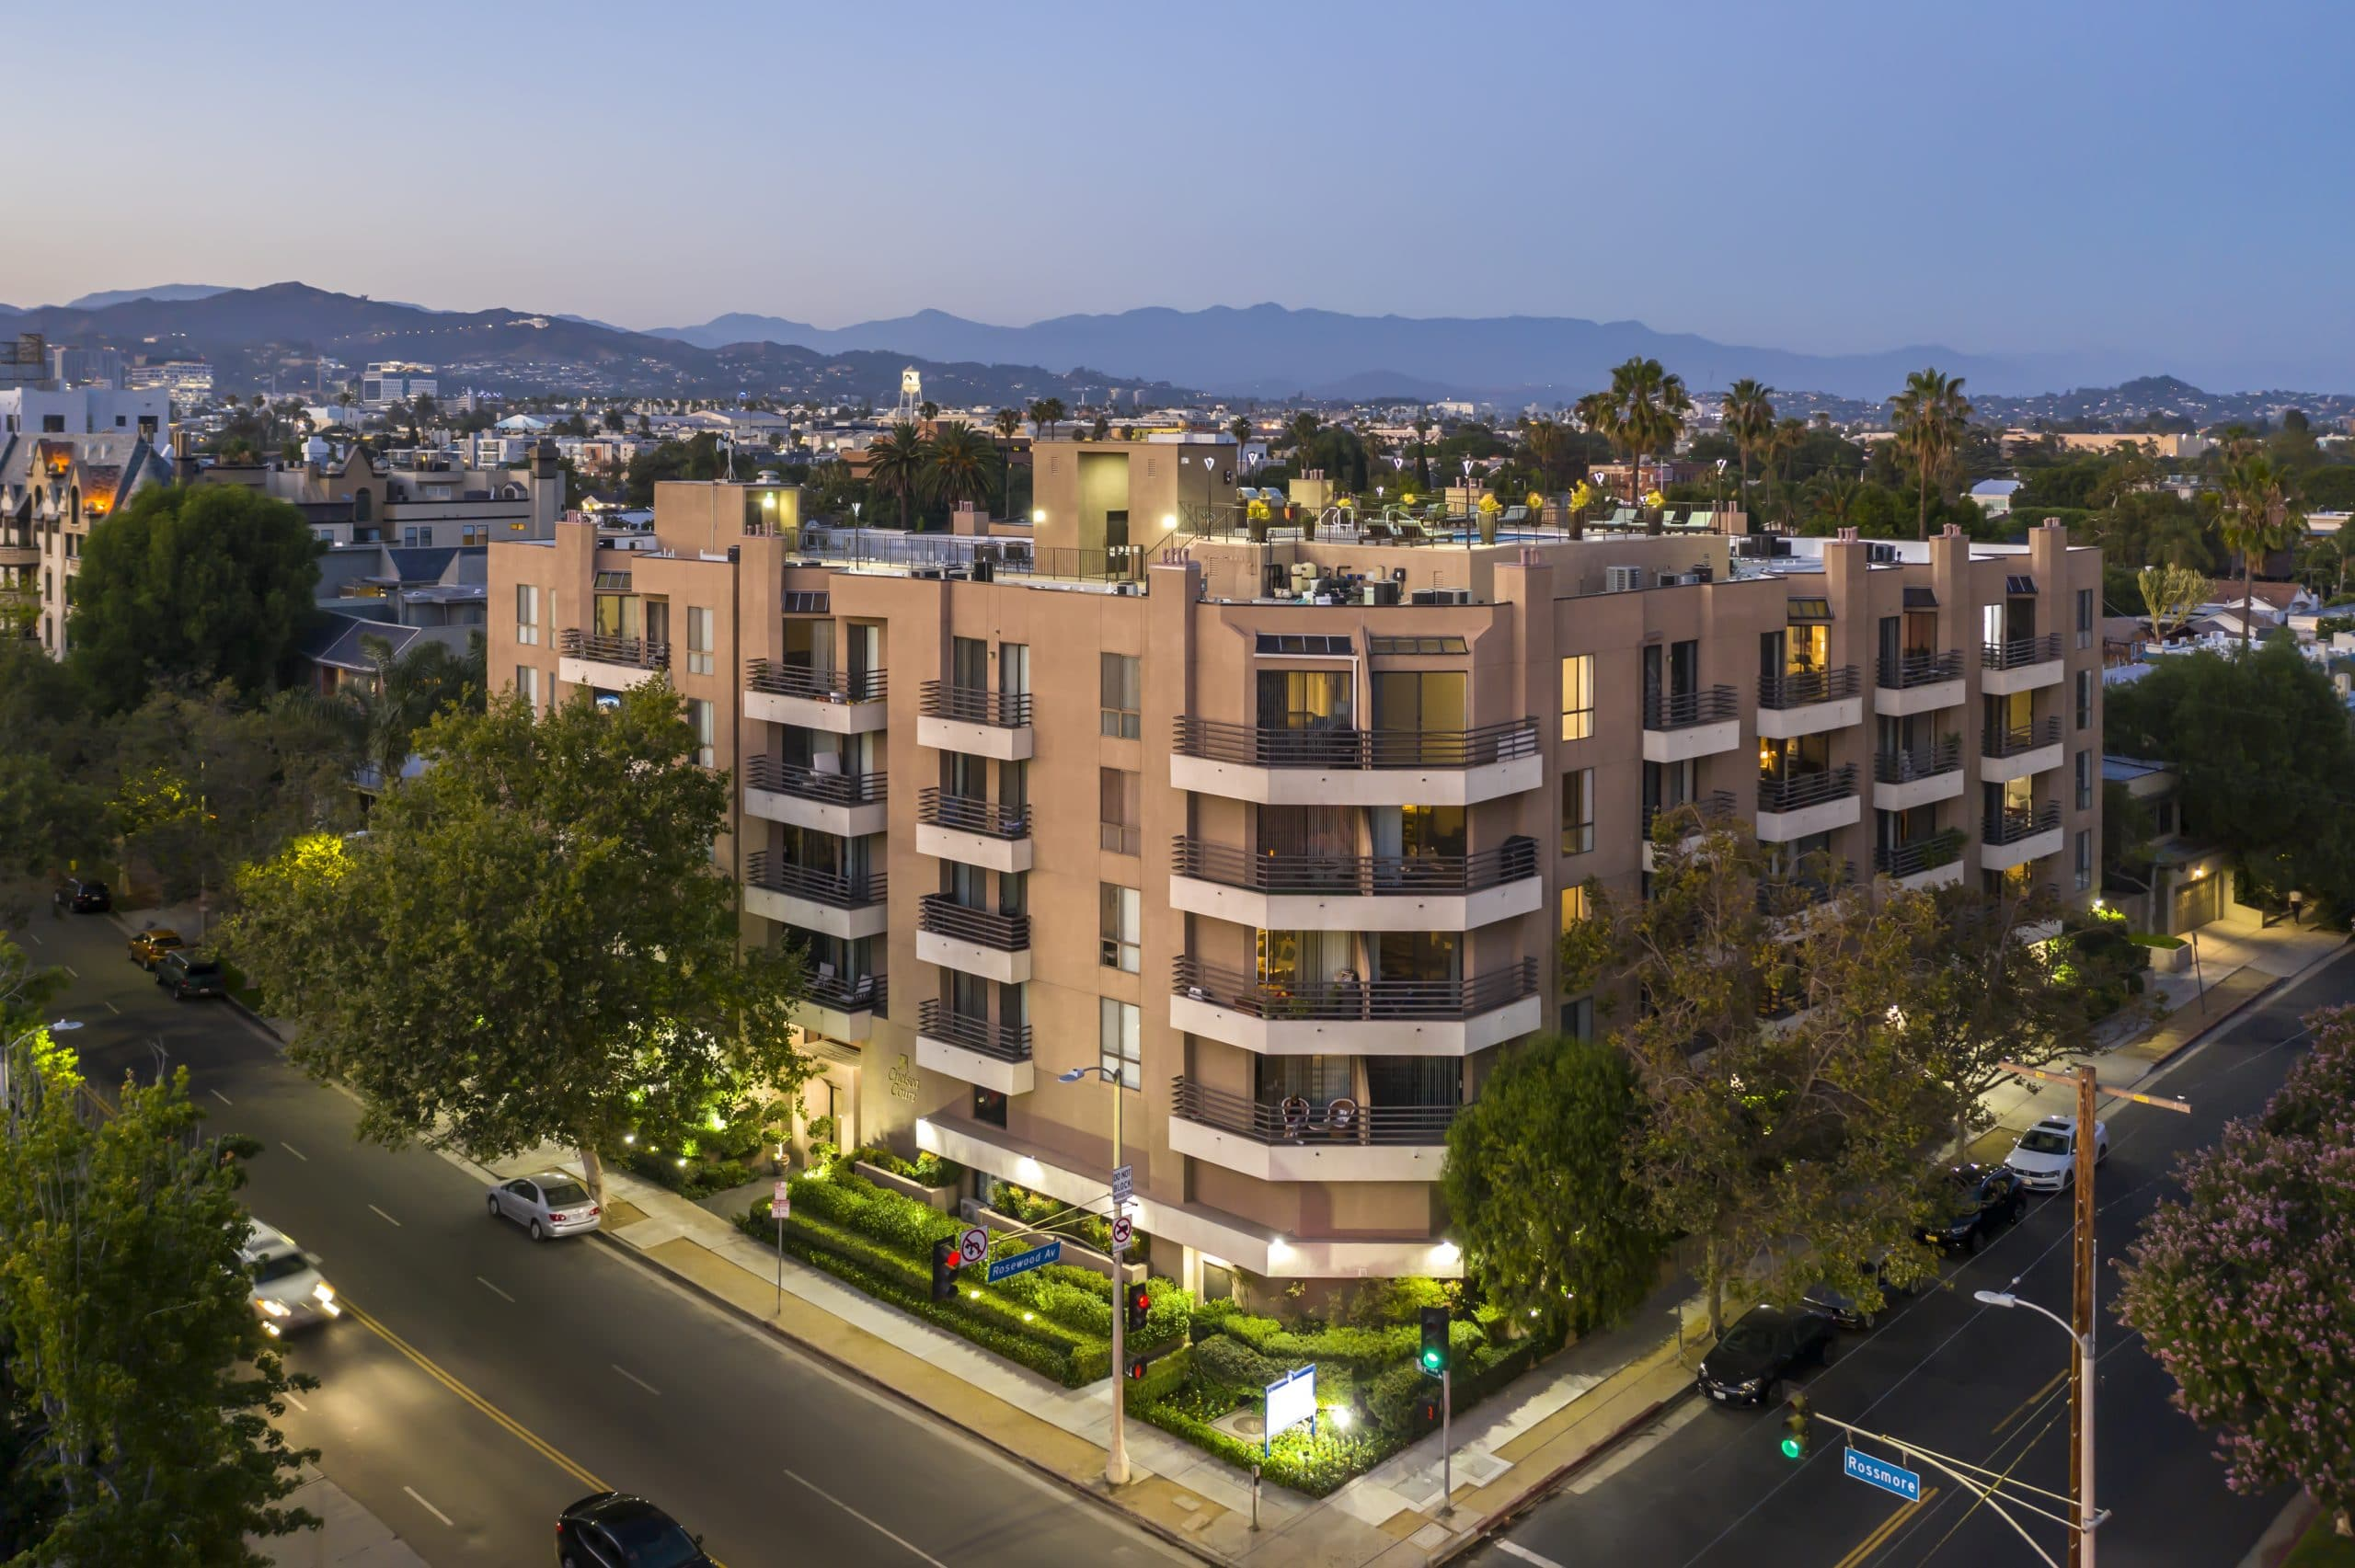 Apartments for rent in Hancock Park, California